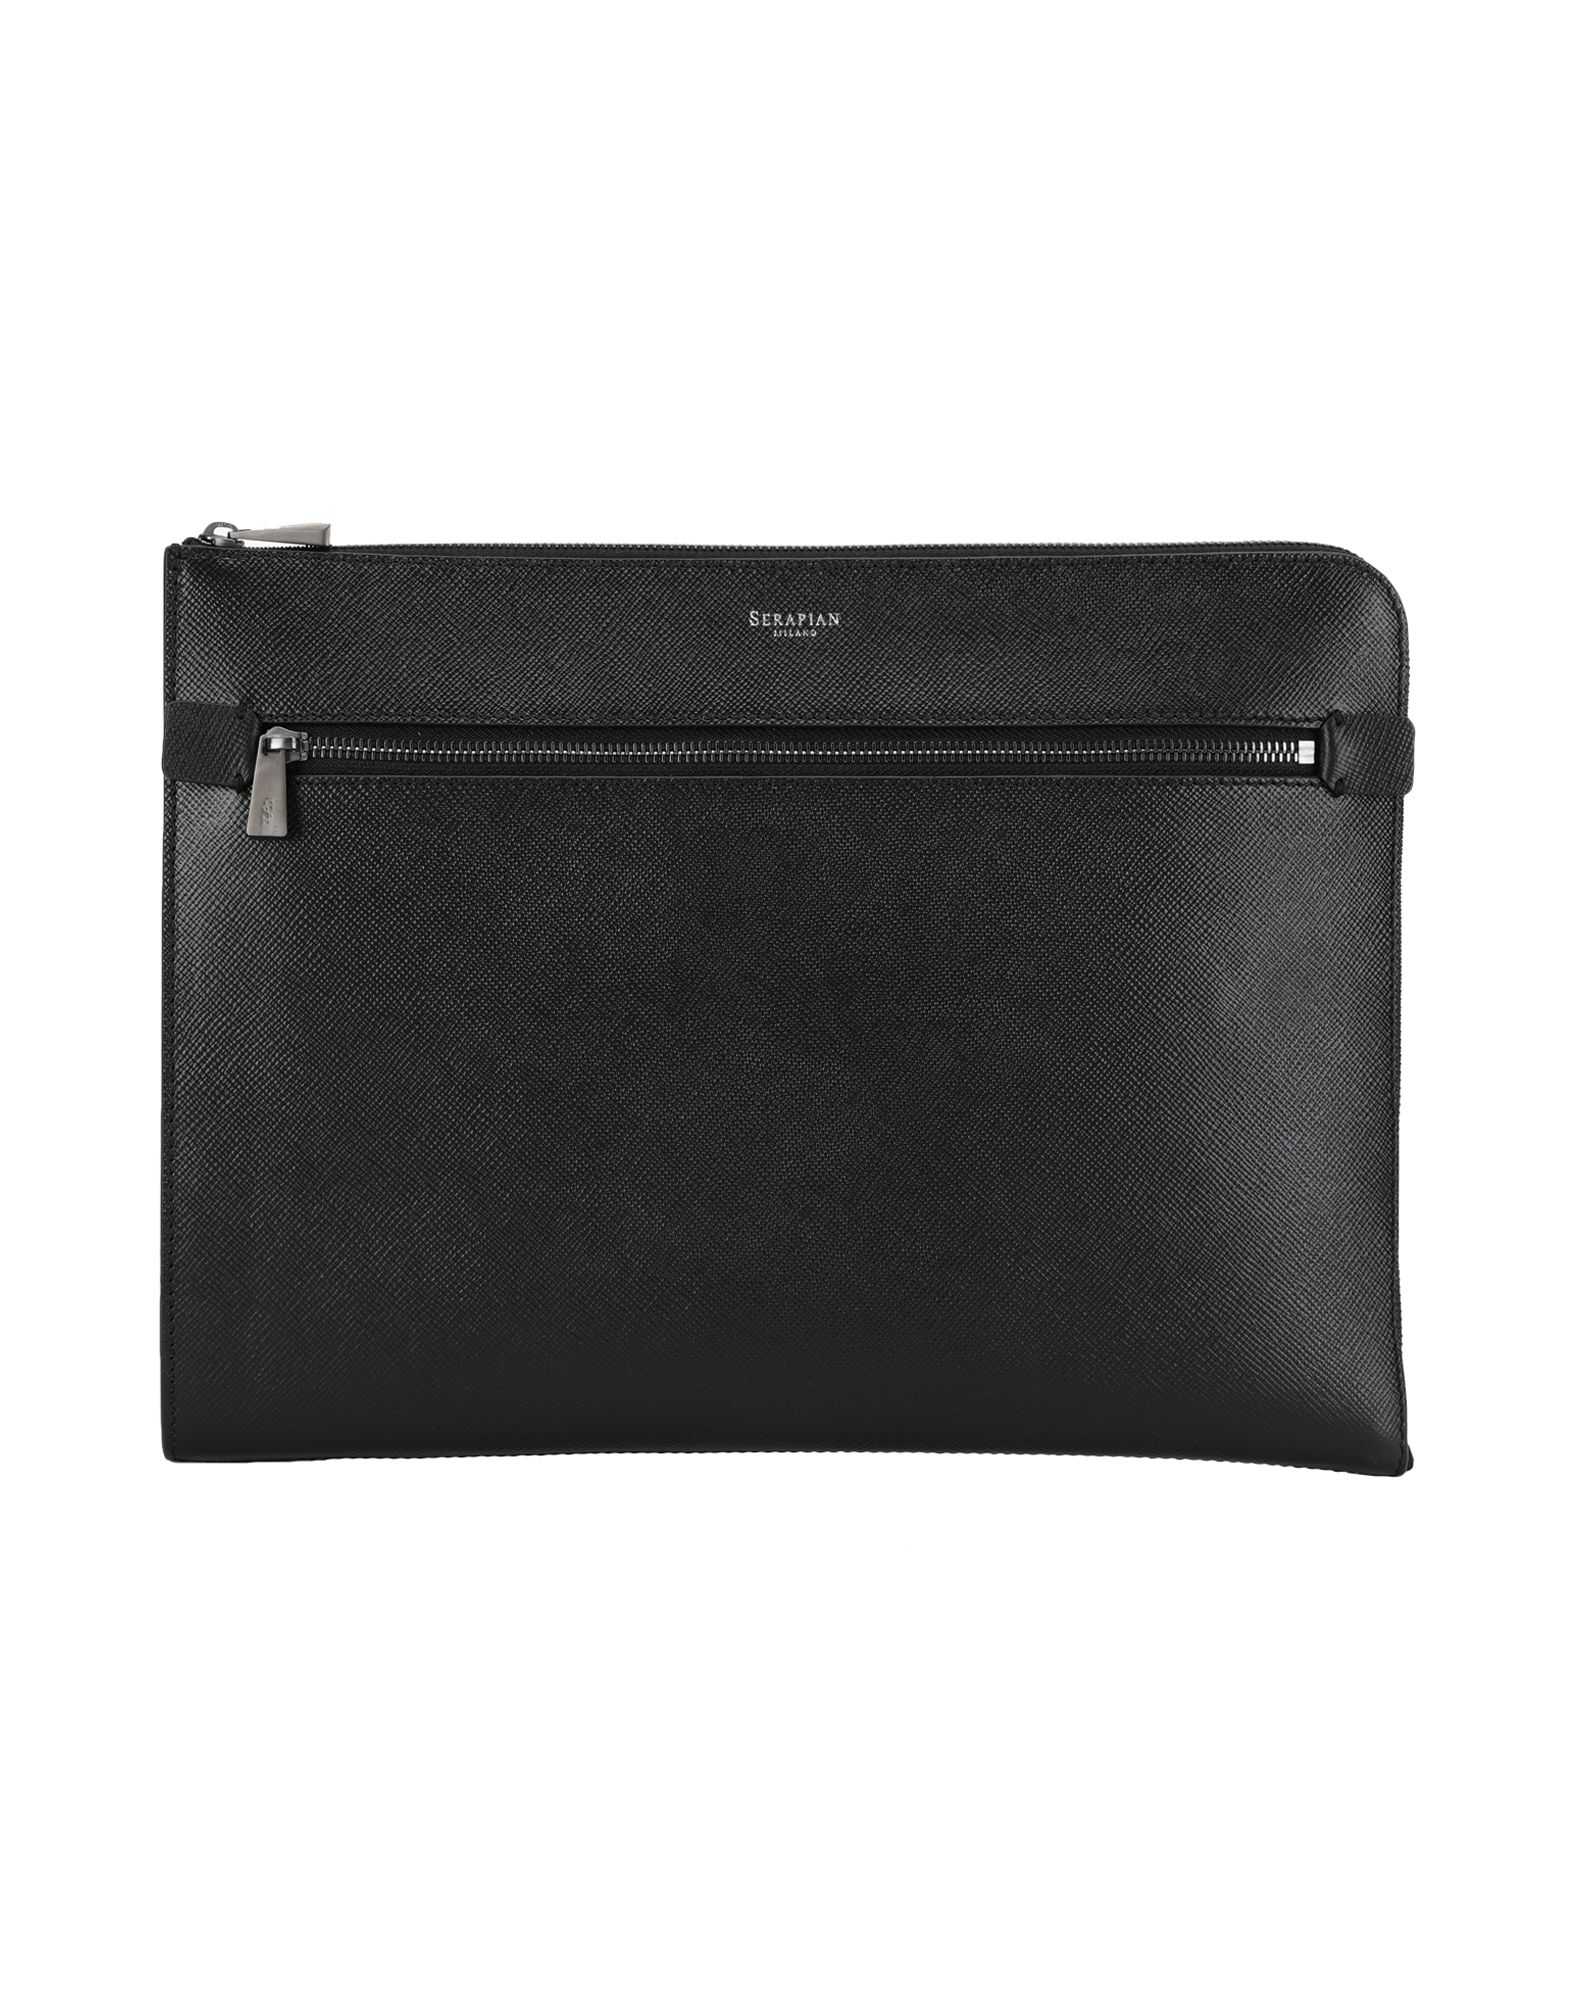 SERAPIAN Деловые сумки bag giulia monti сумки деловые